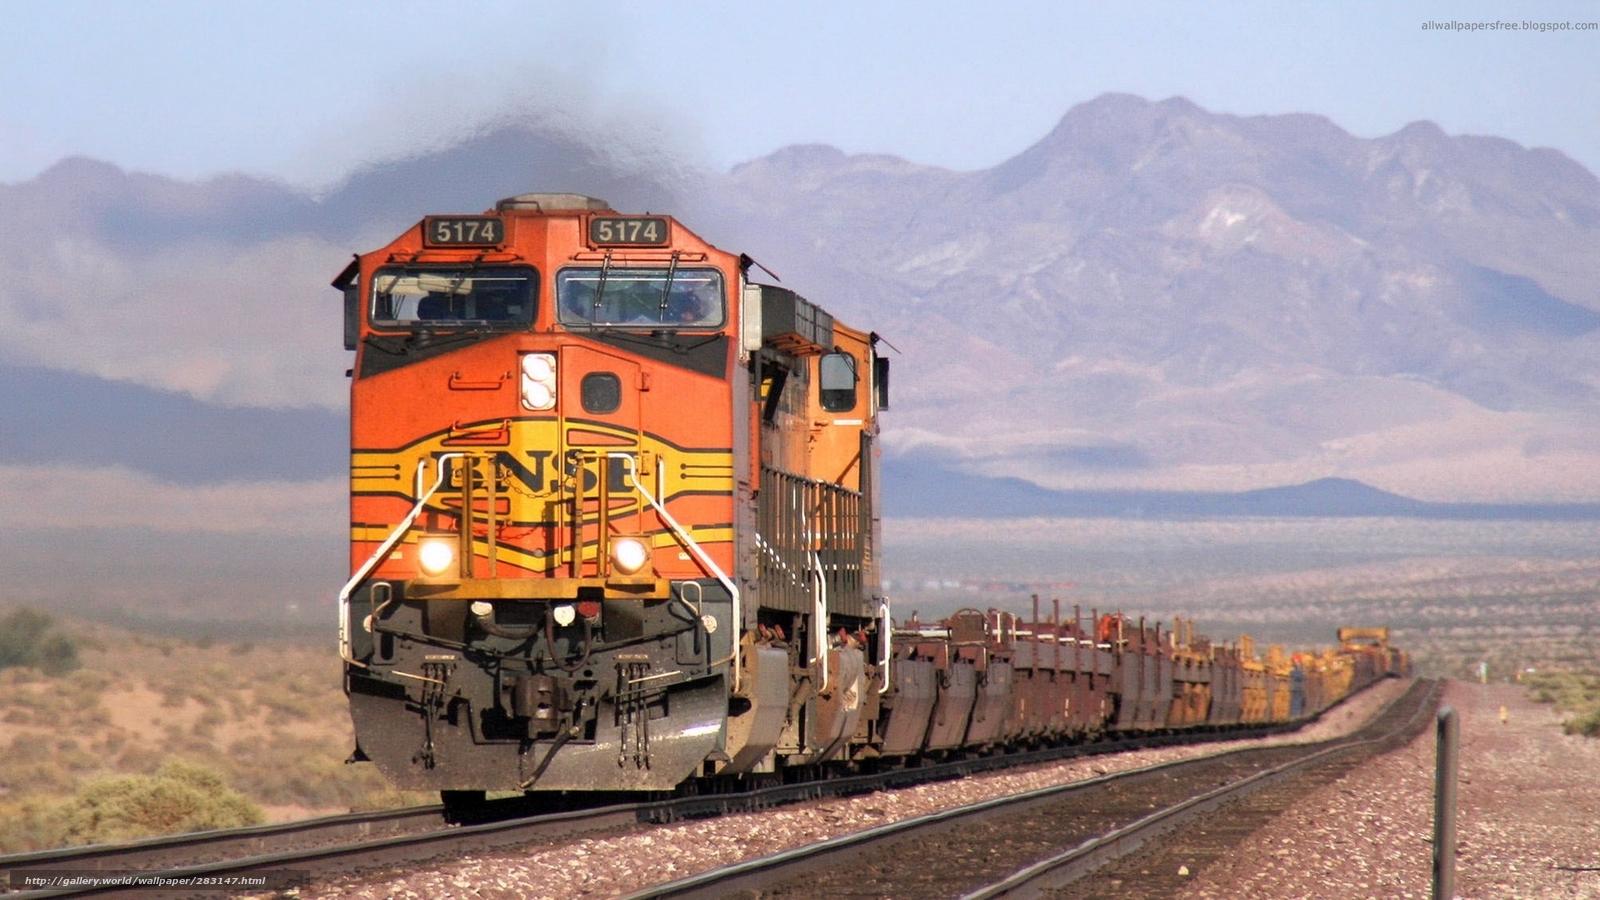 Fotos de trenes de carga